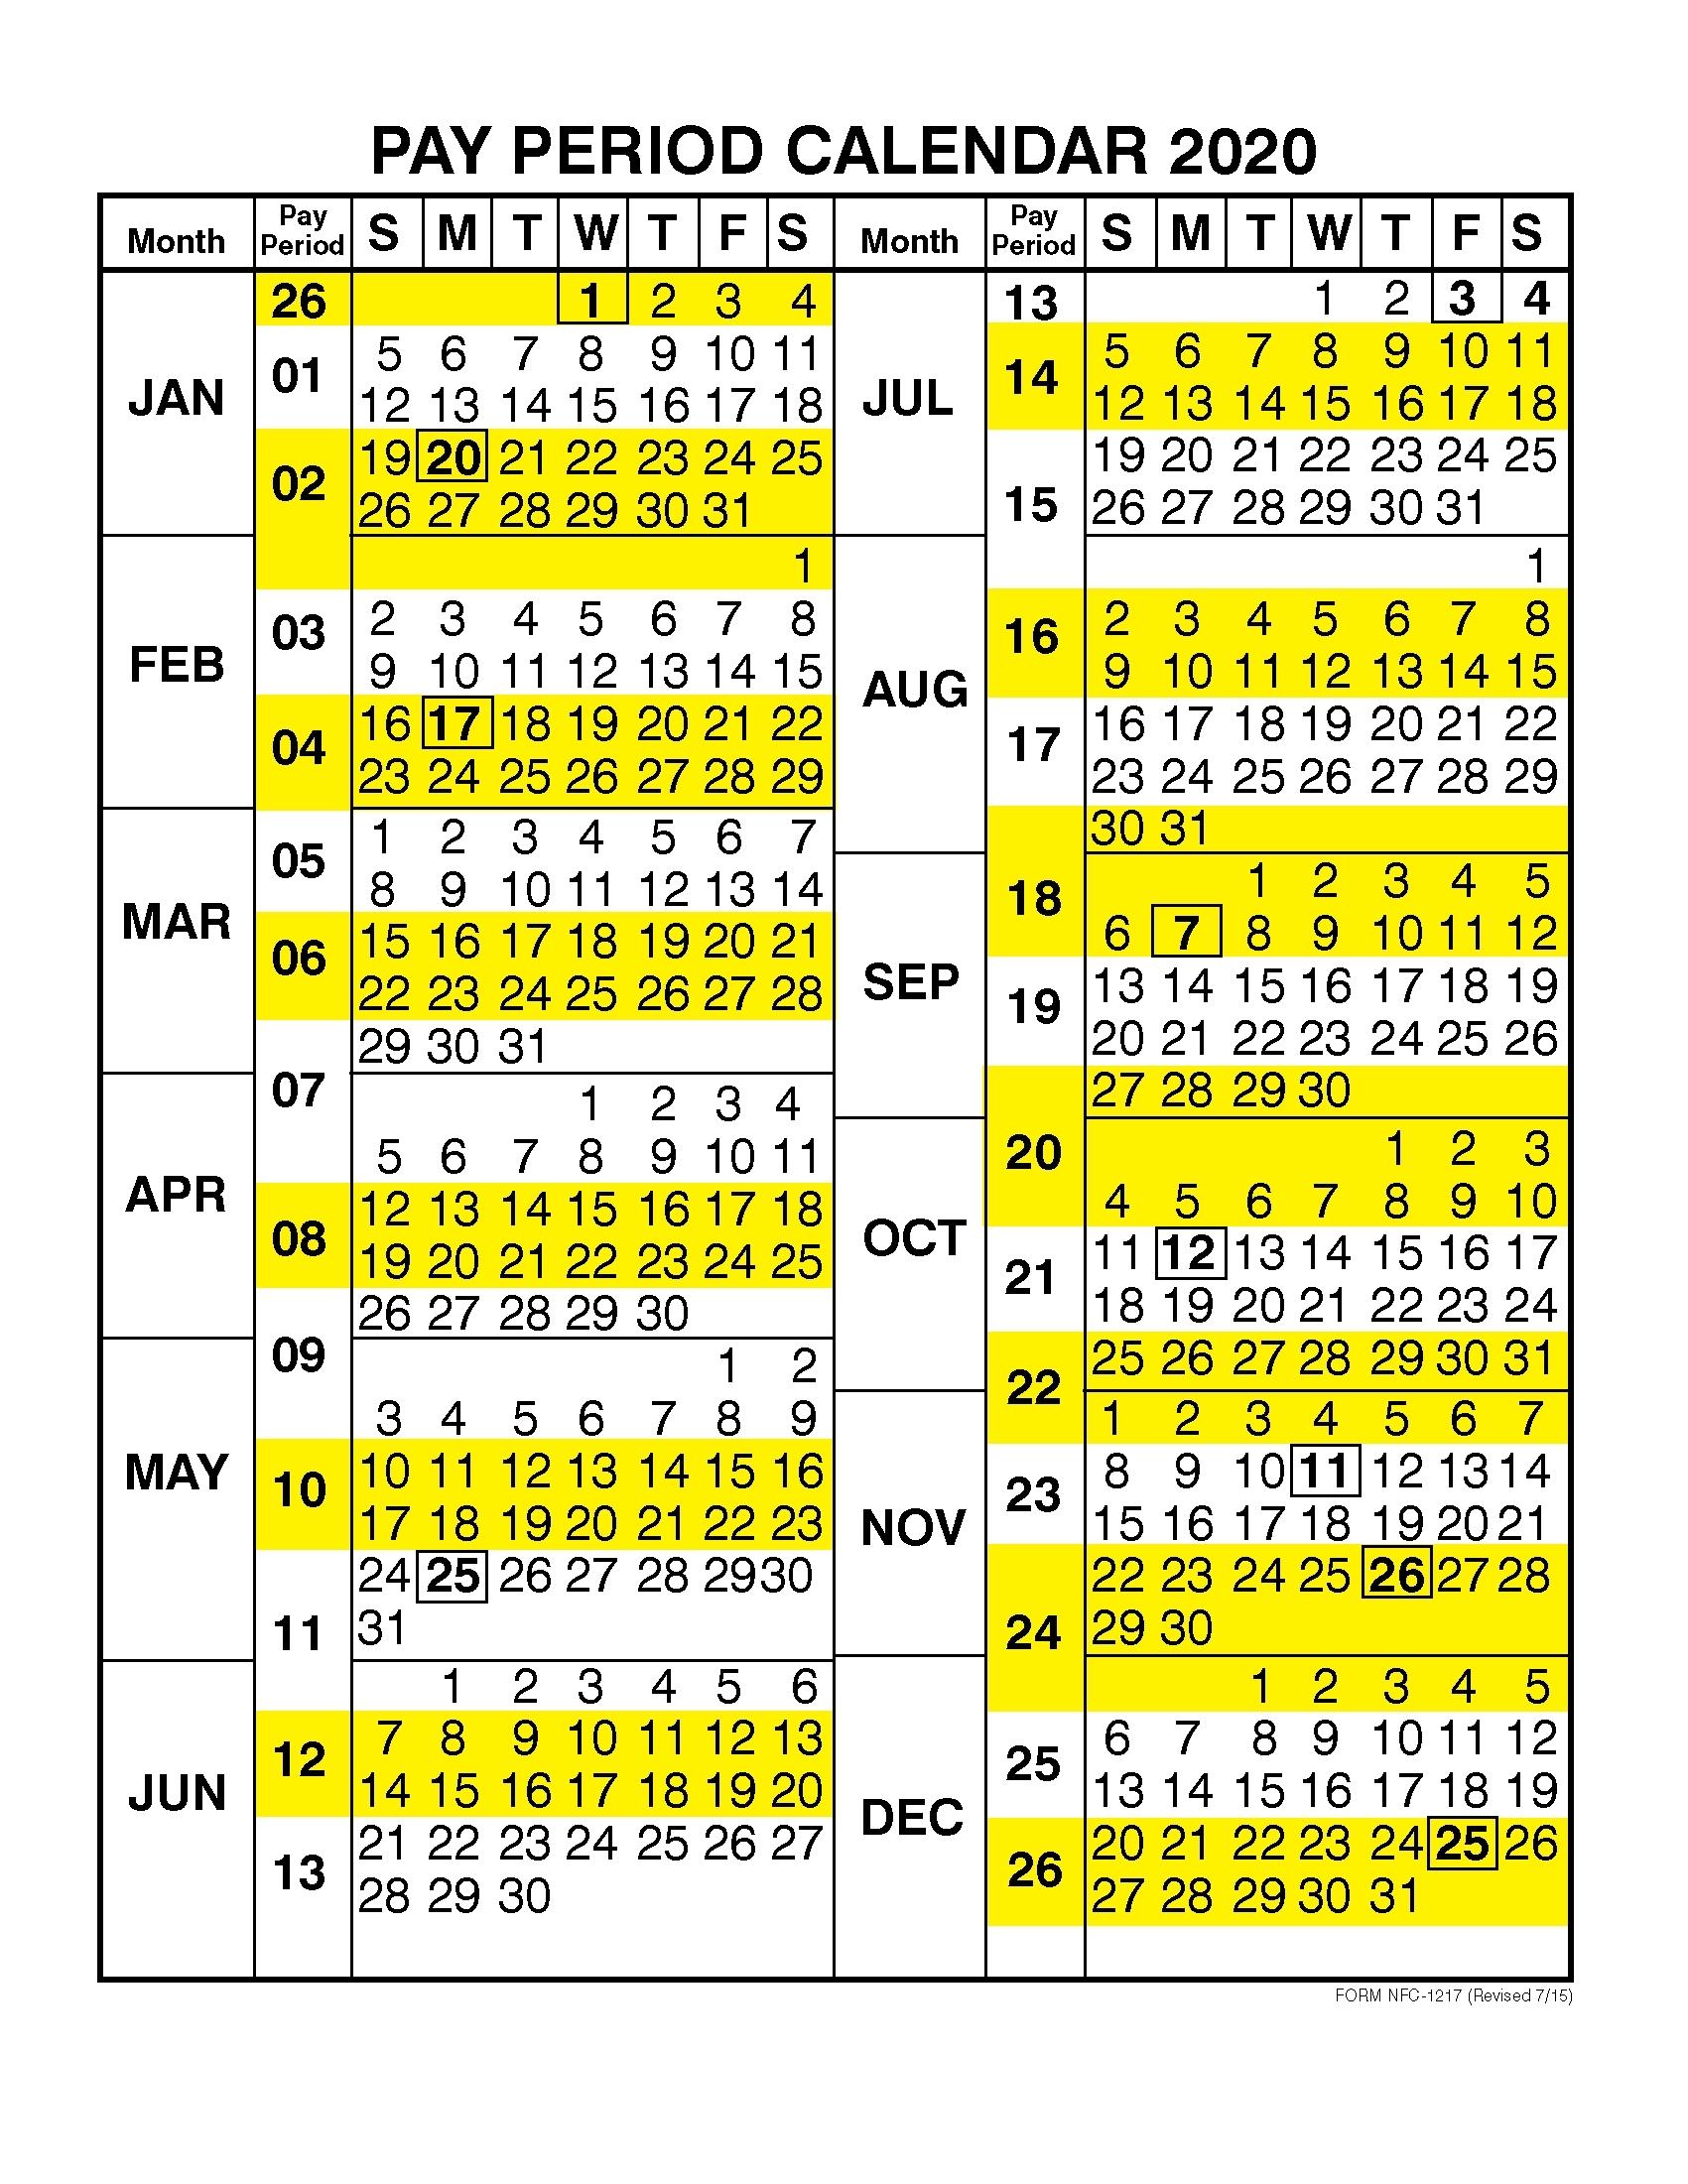 Get 2021 Pay Period Calendar